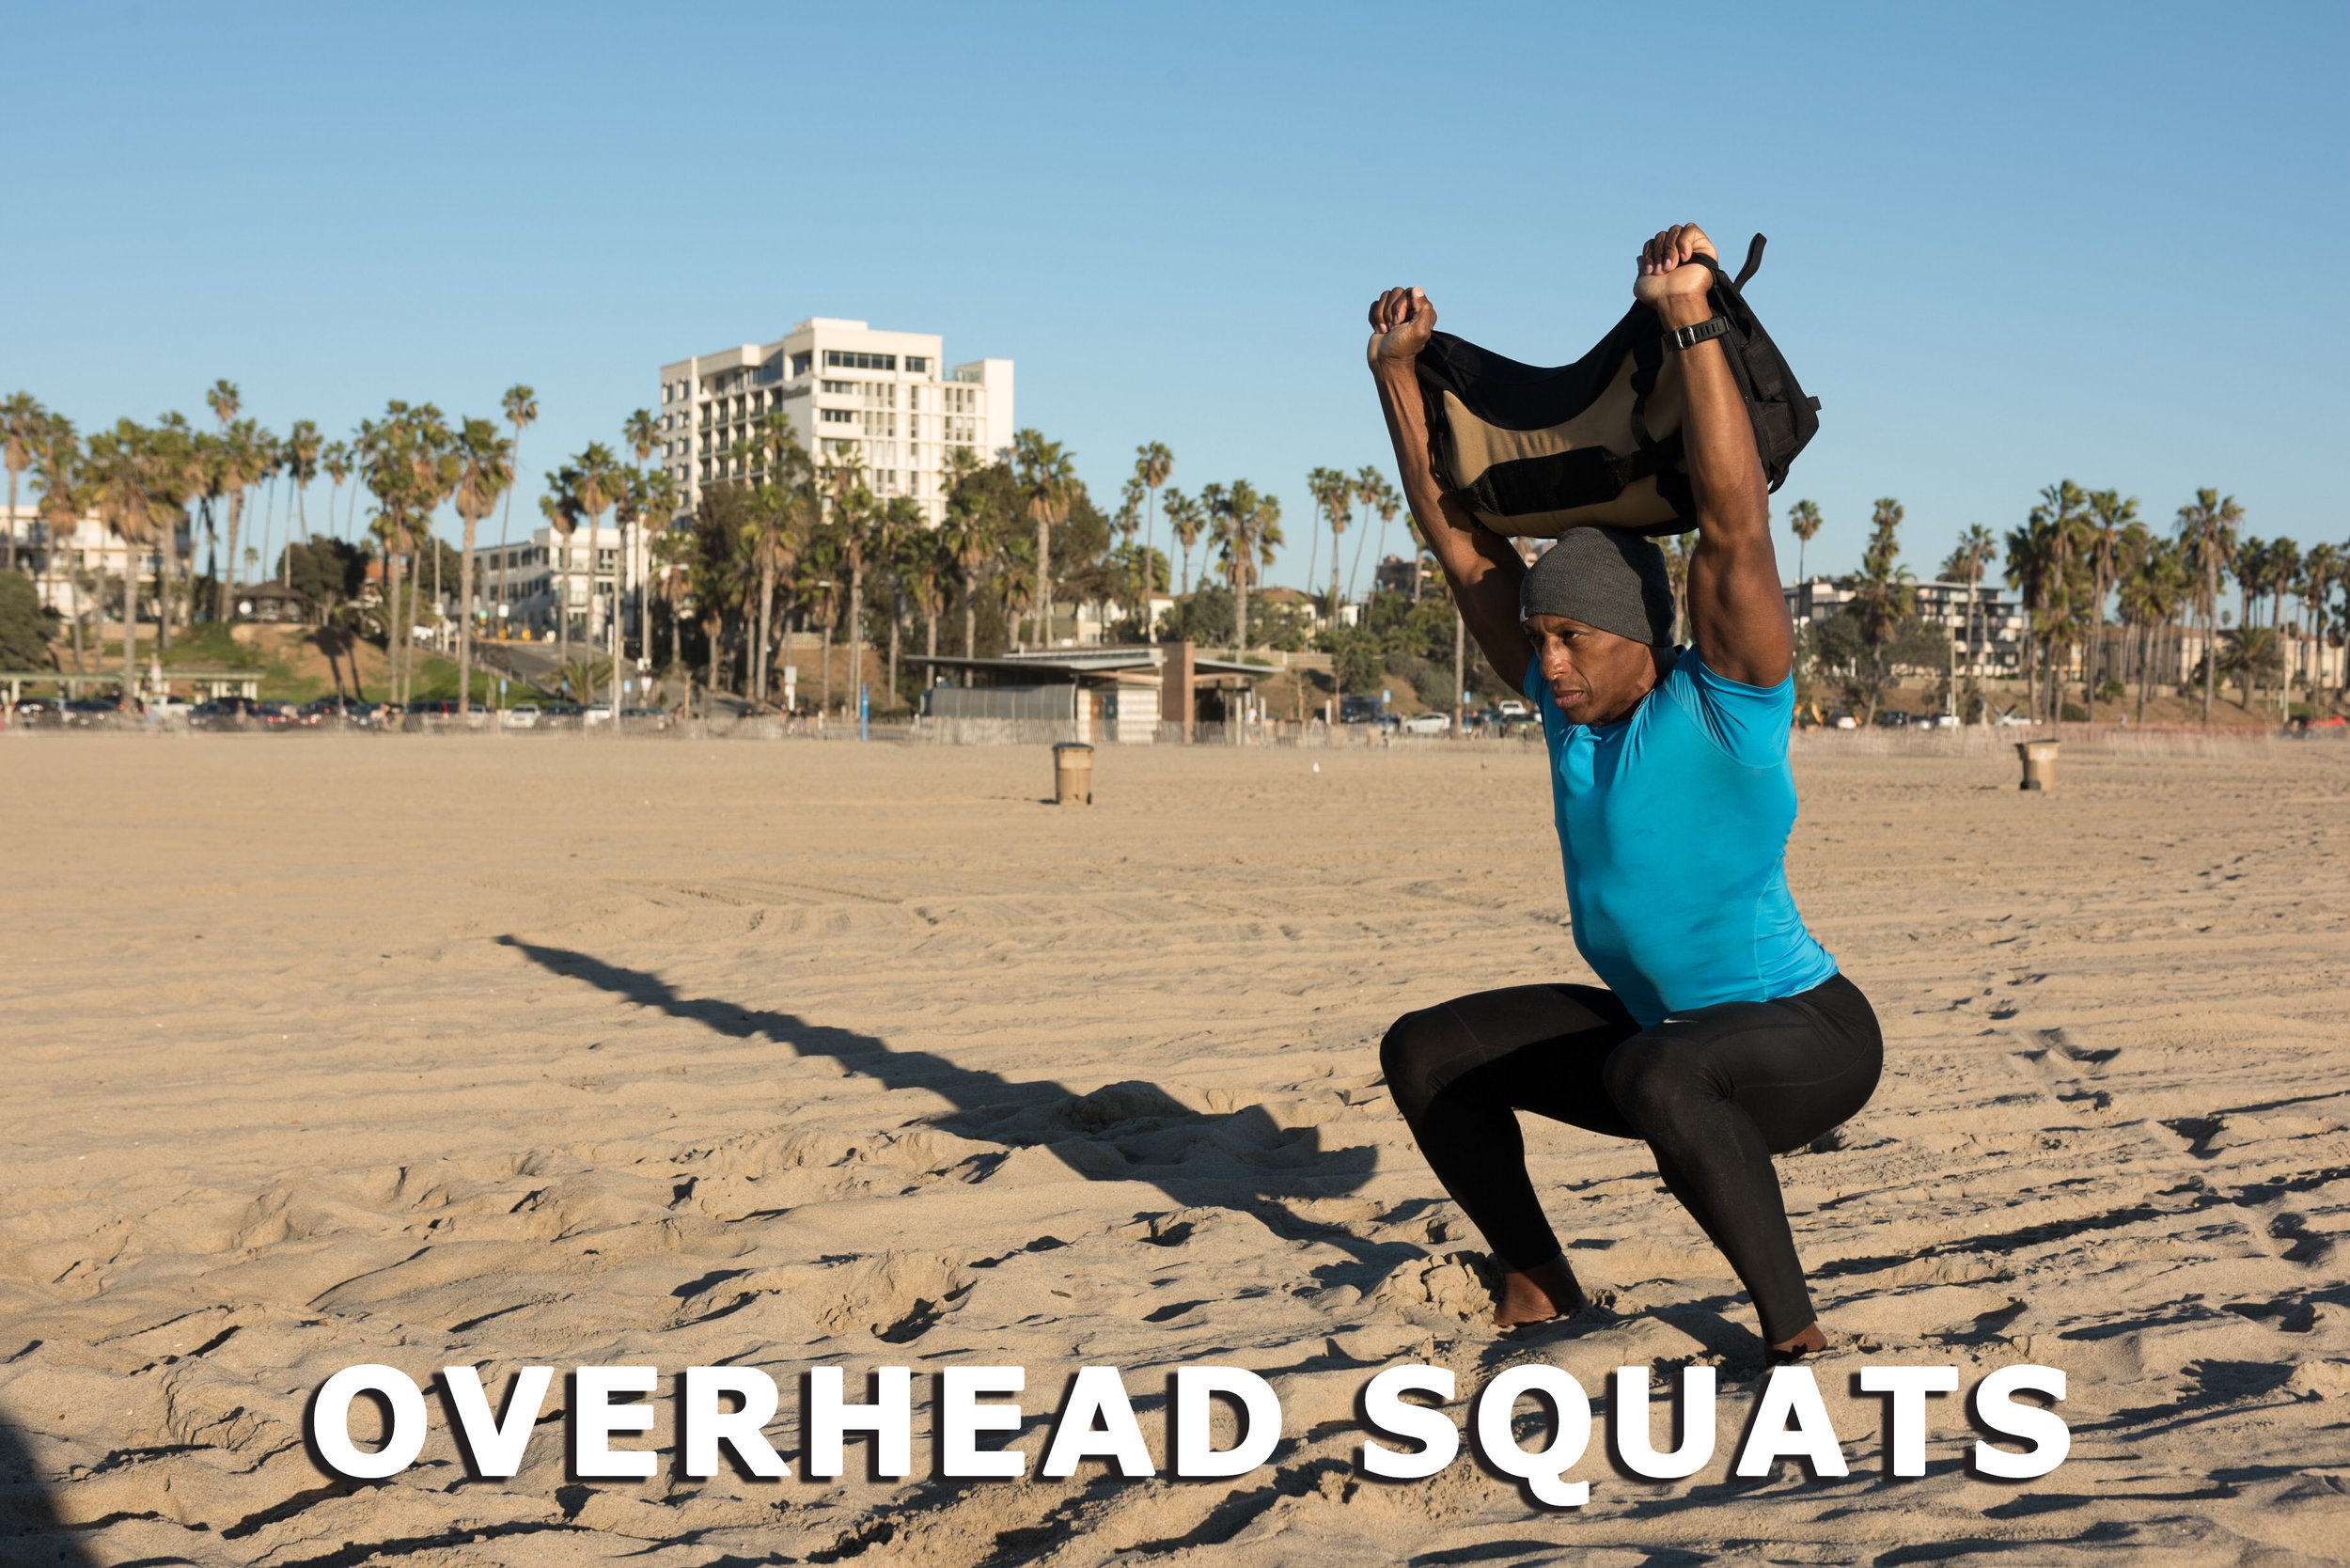 Overheadsquats.jpg